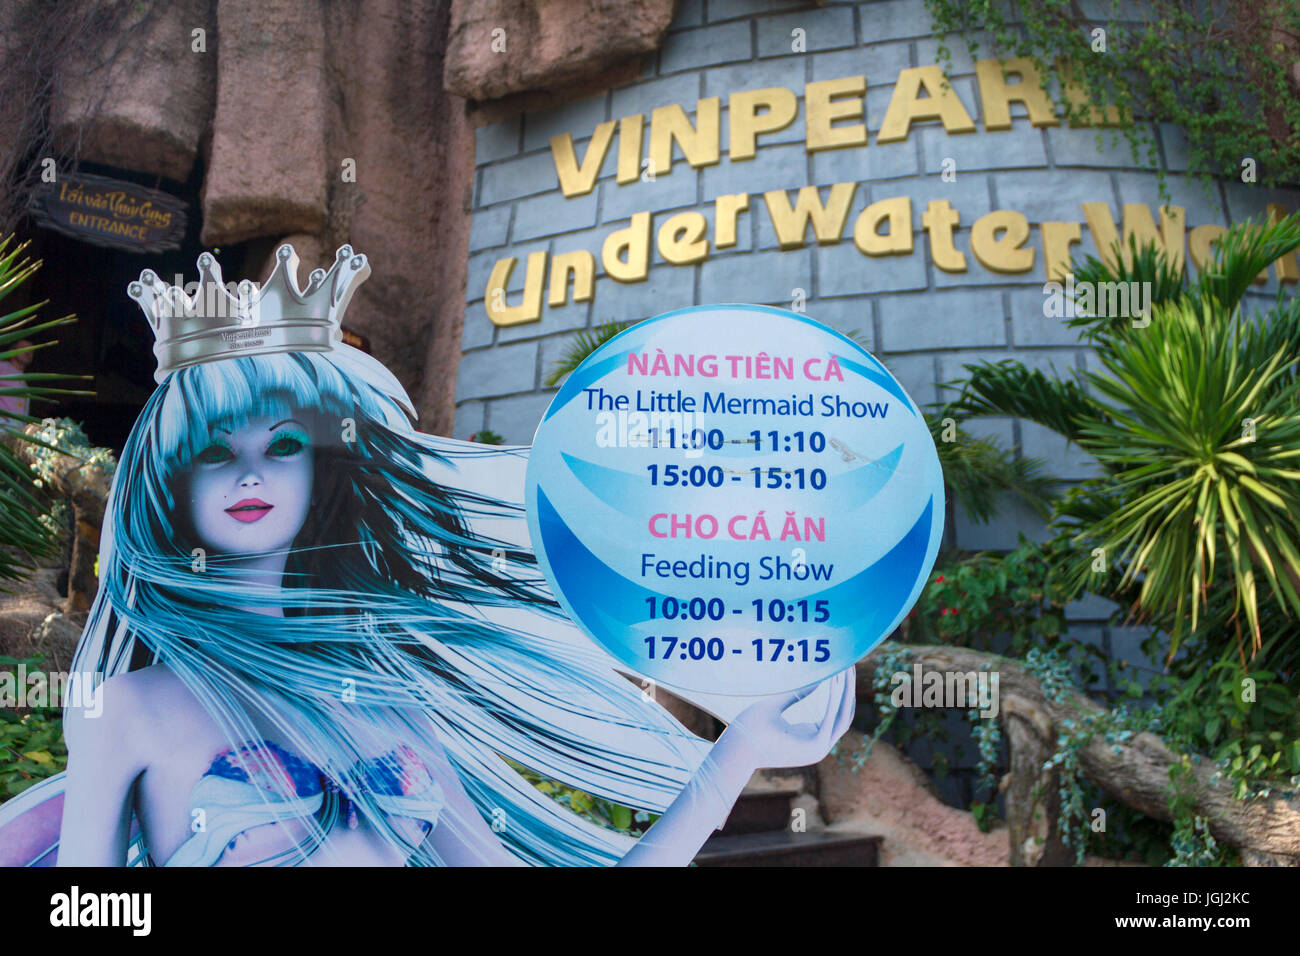 VINPEARL RESORT, NHA TRANG, VIETNAM, MARCH 5, 2016 - Vinpearl UnderWaterWorld entrance decoration. - Stock Image